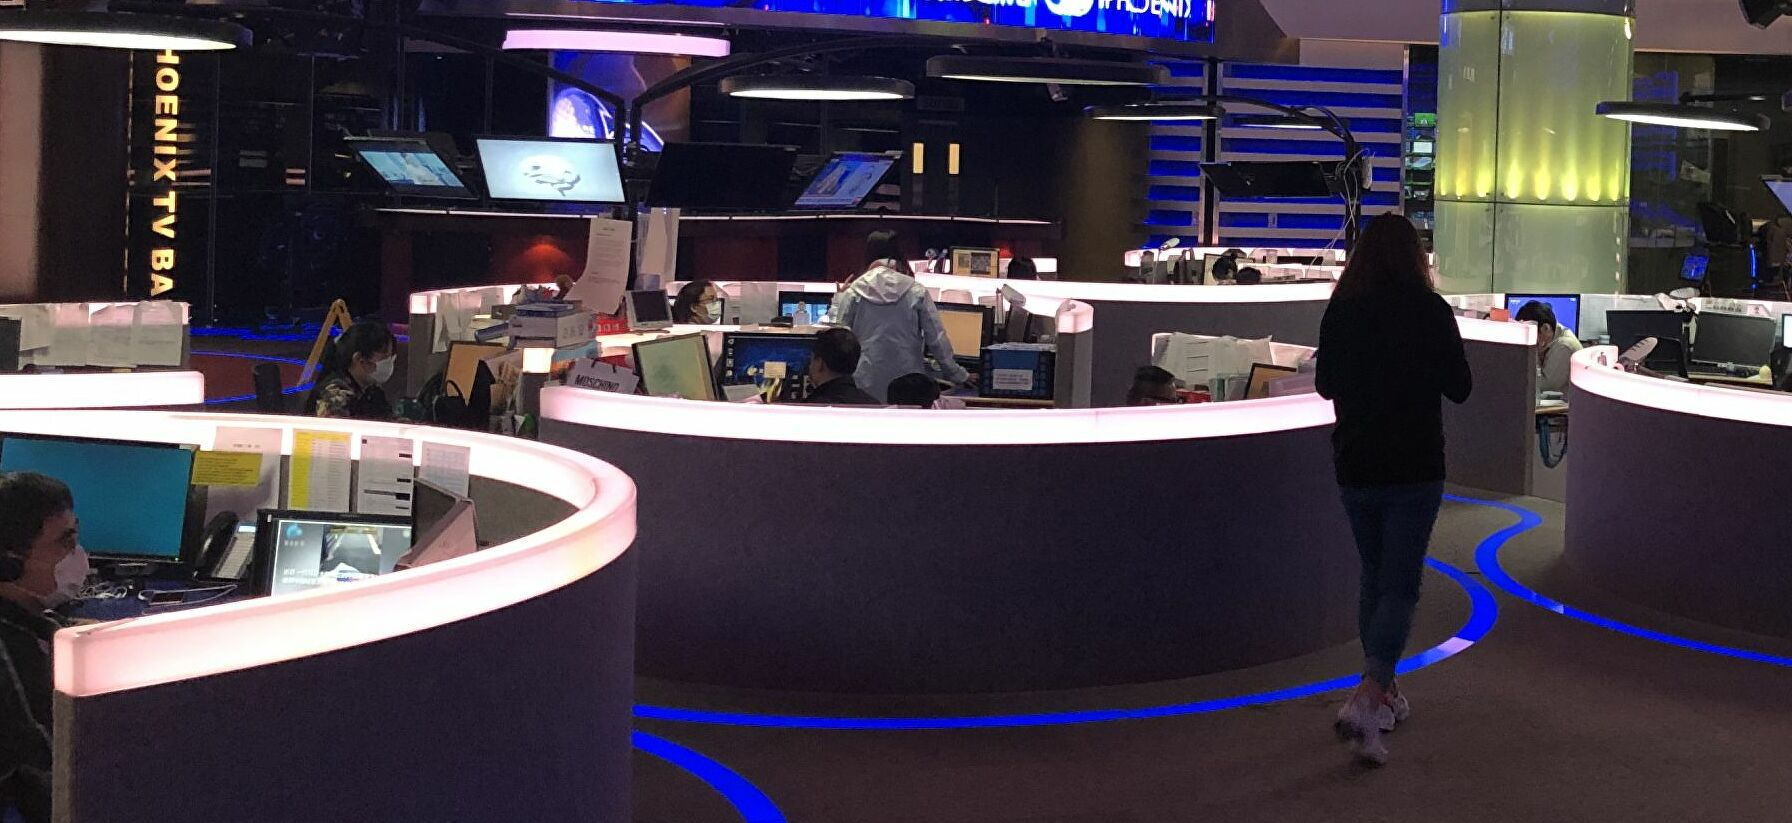 Newsroom remains busy, but masks become a must. Hong Kong amid COVID-19 pandemic